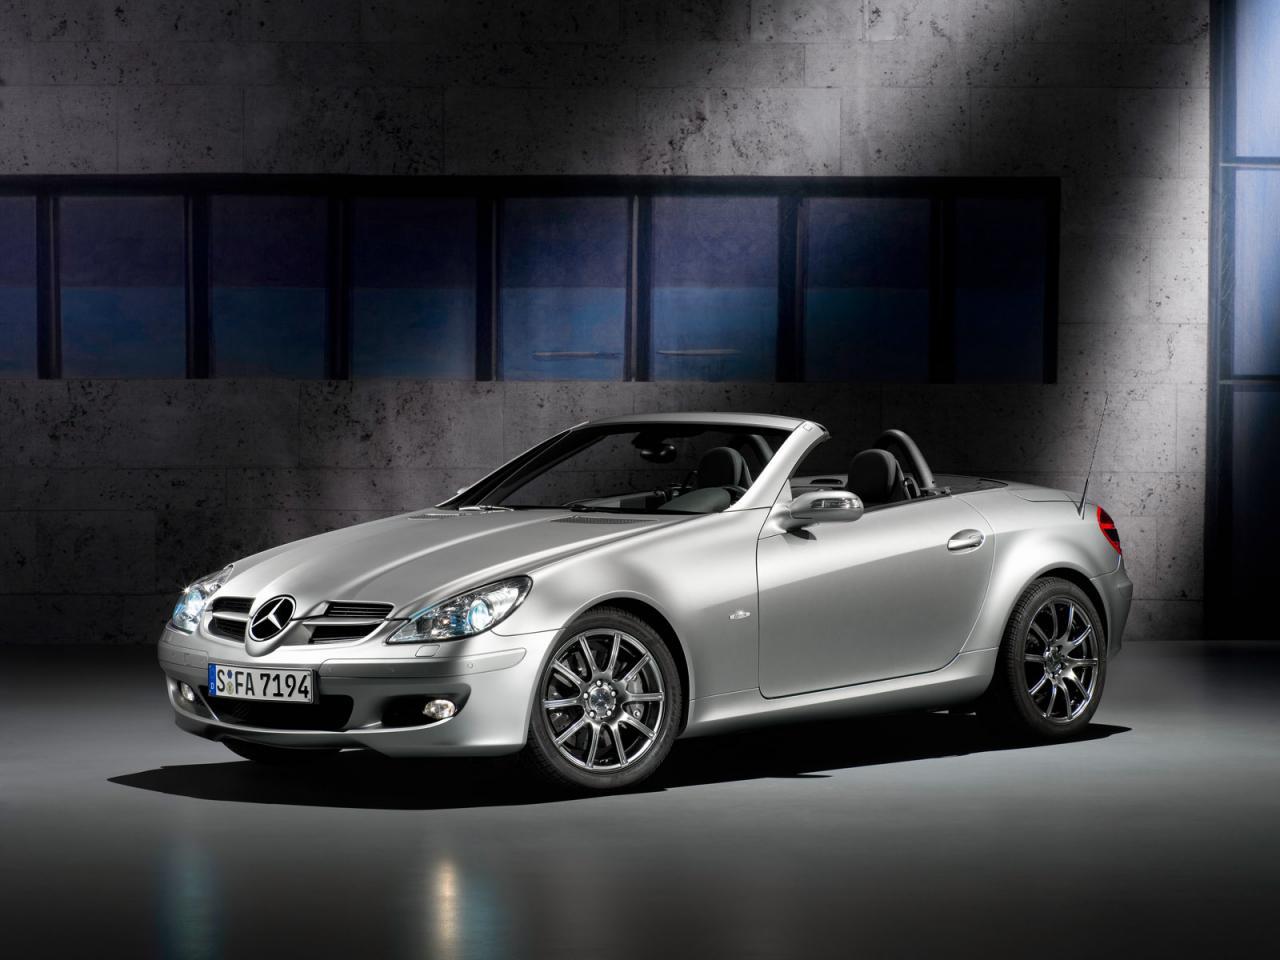 2006 Mercedes Benz SLK R171 350